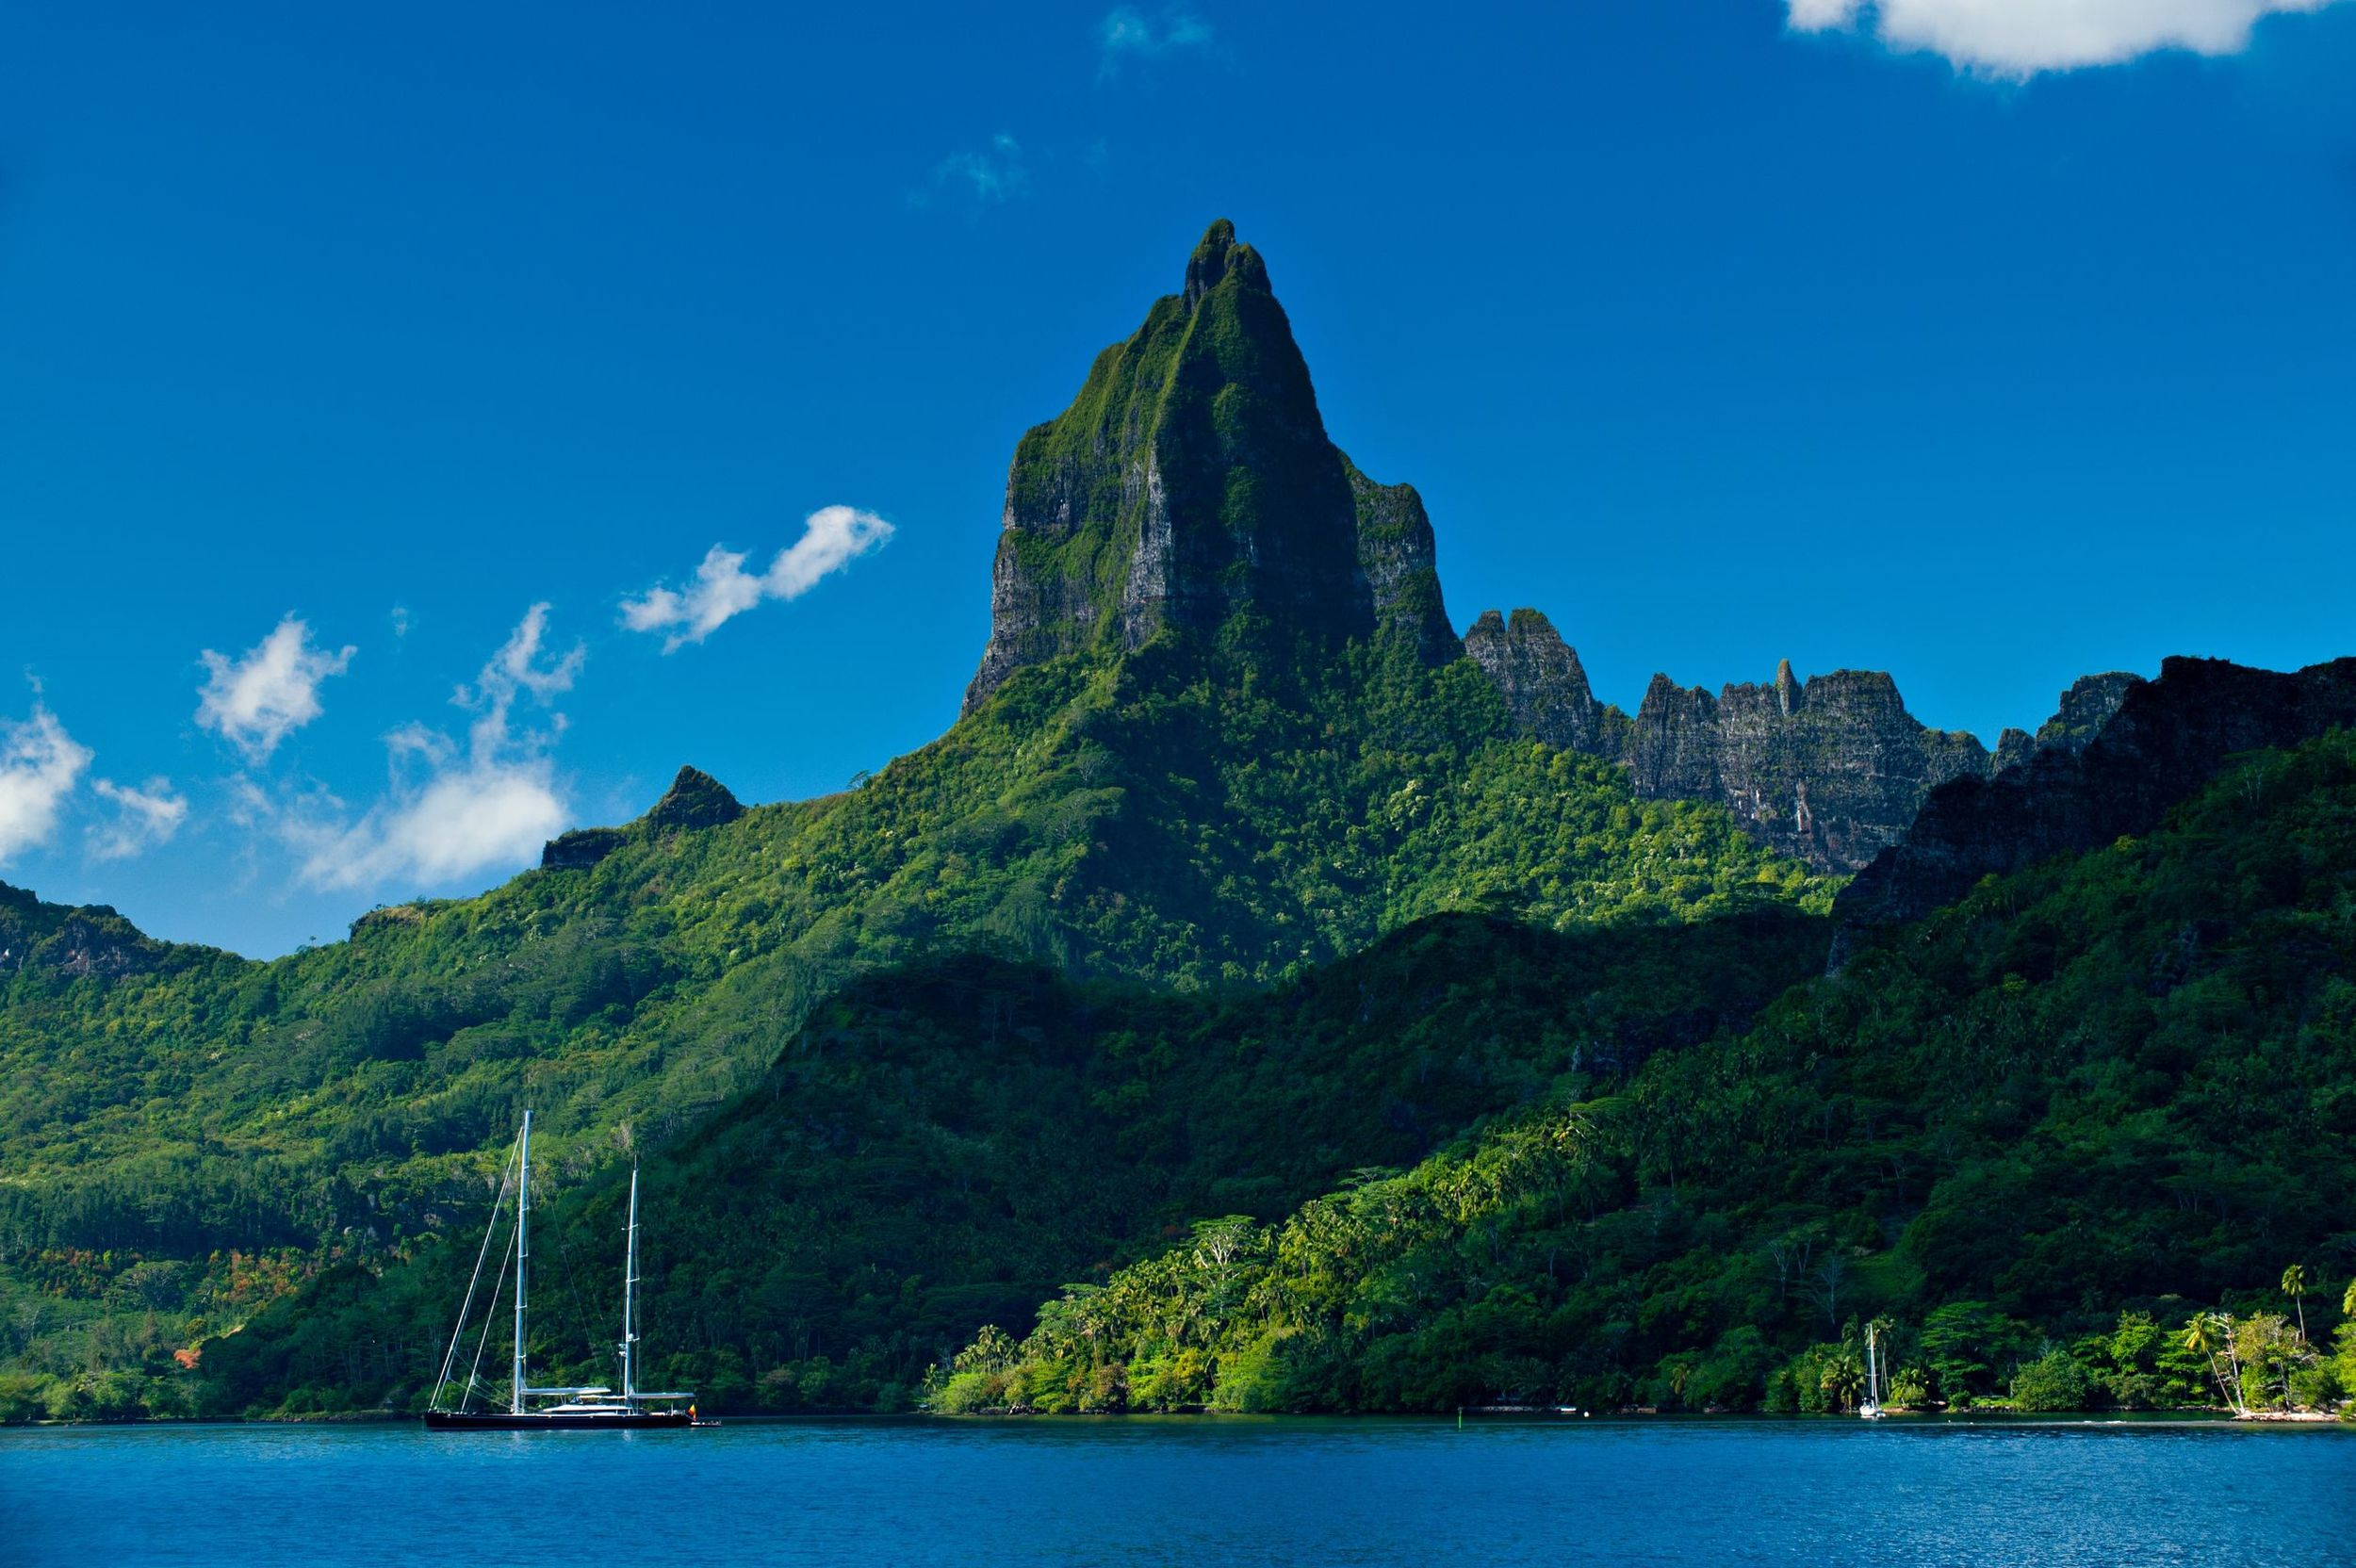 Moorea-Island-Roto-Nui-Volcanic-Mountain-Tahiti.jpg